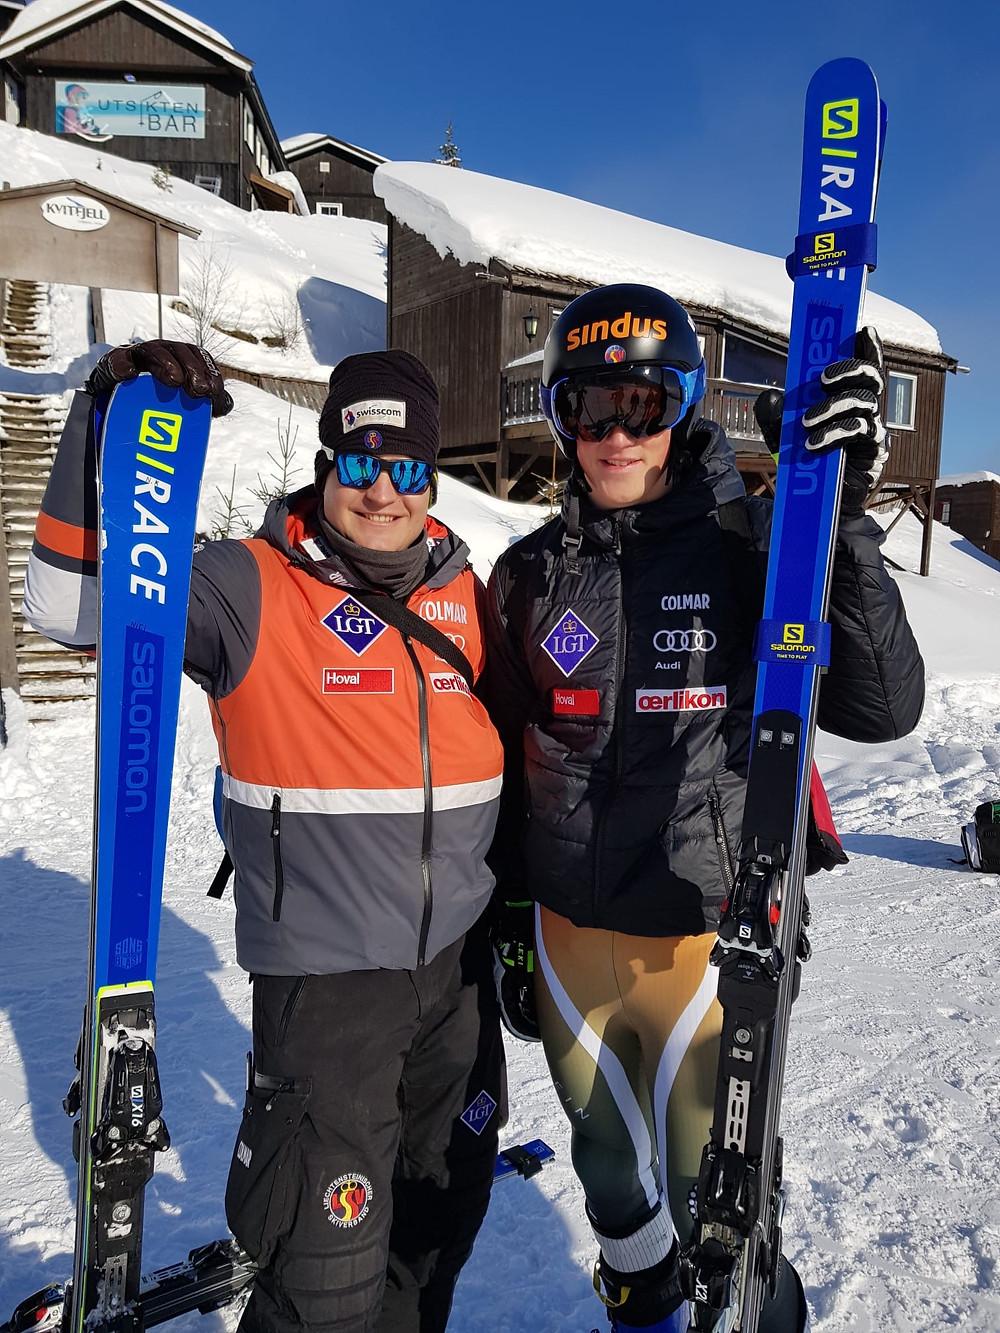 Nicola Kindle und Nico Gauer